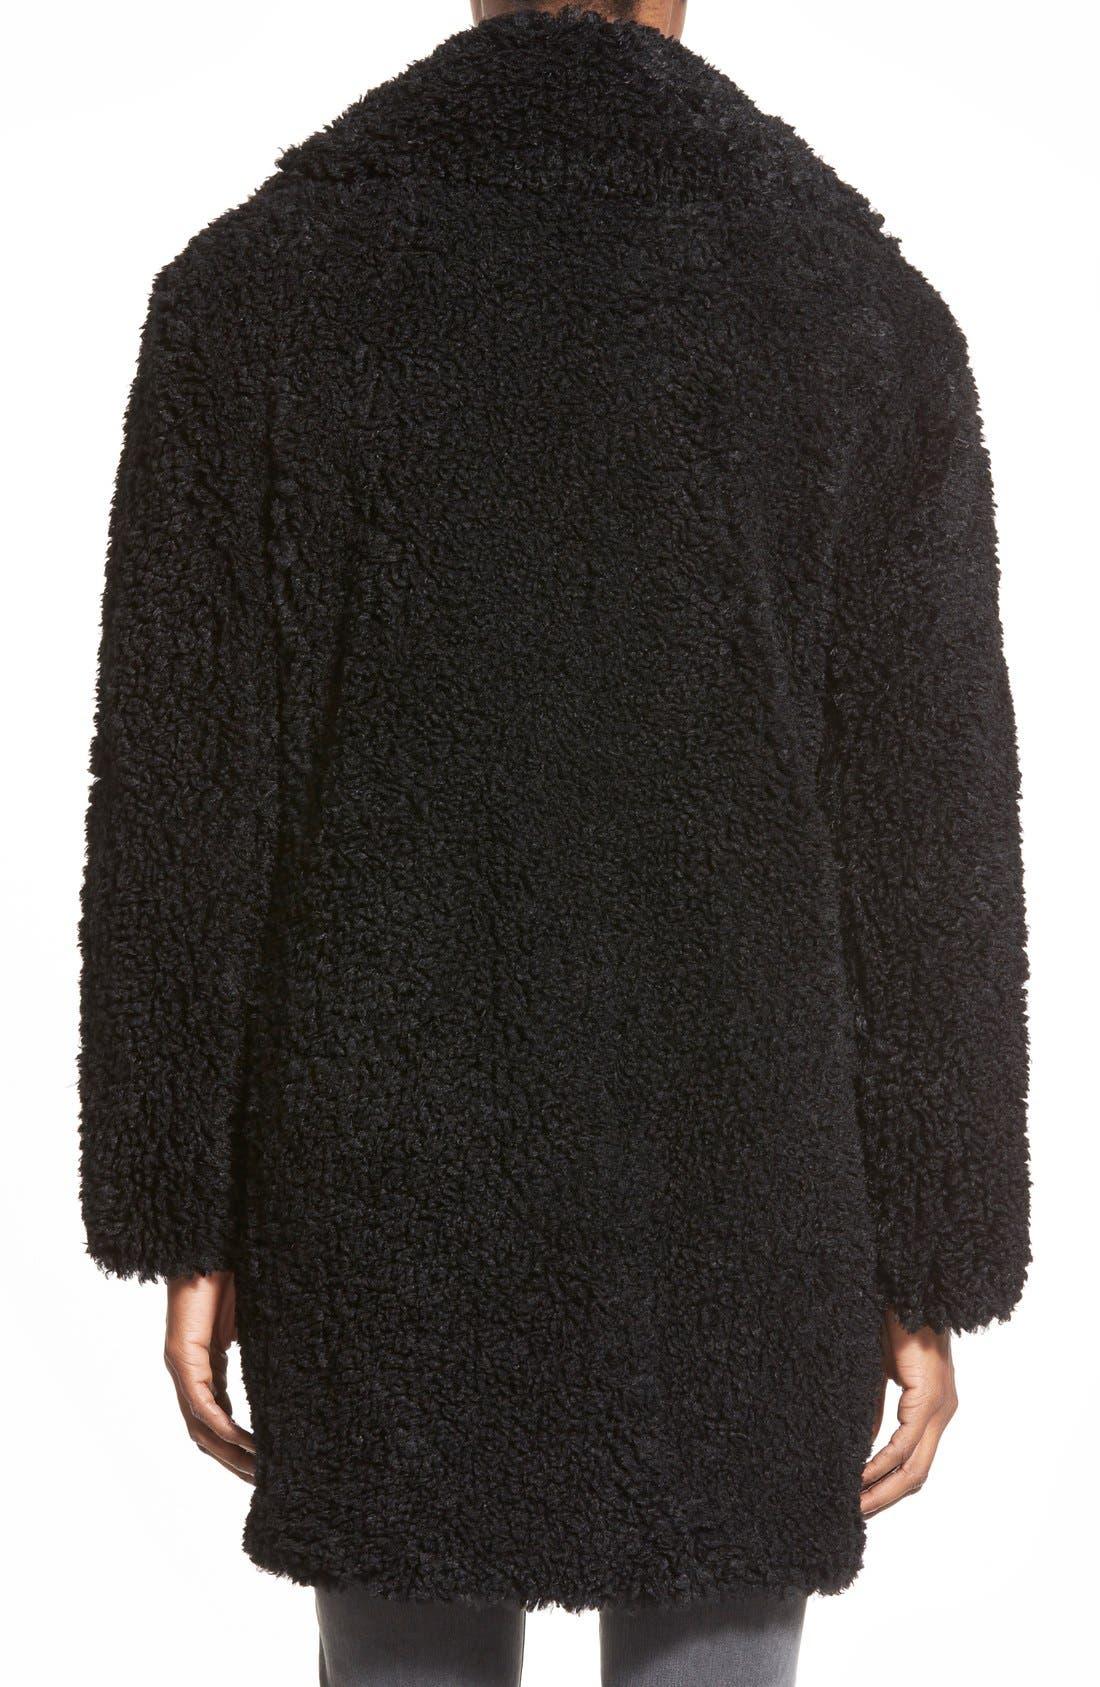 'Teddy Bear' Notch Collar Reversible Faux Fur Coat,                             Alternate thumbnail 2, color,                             001